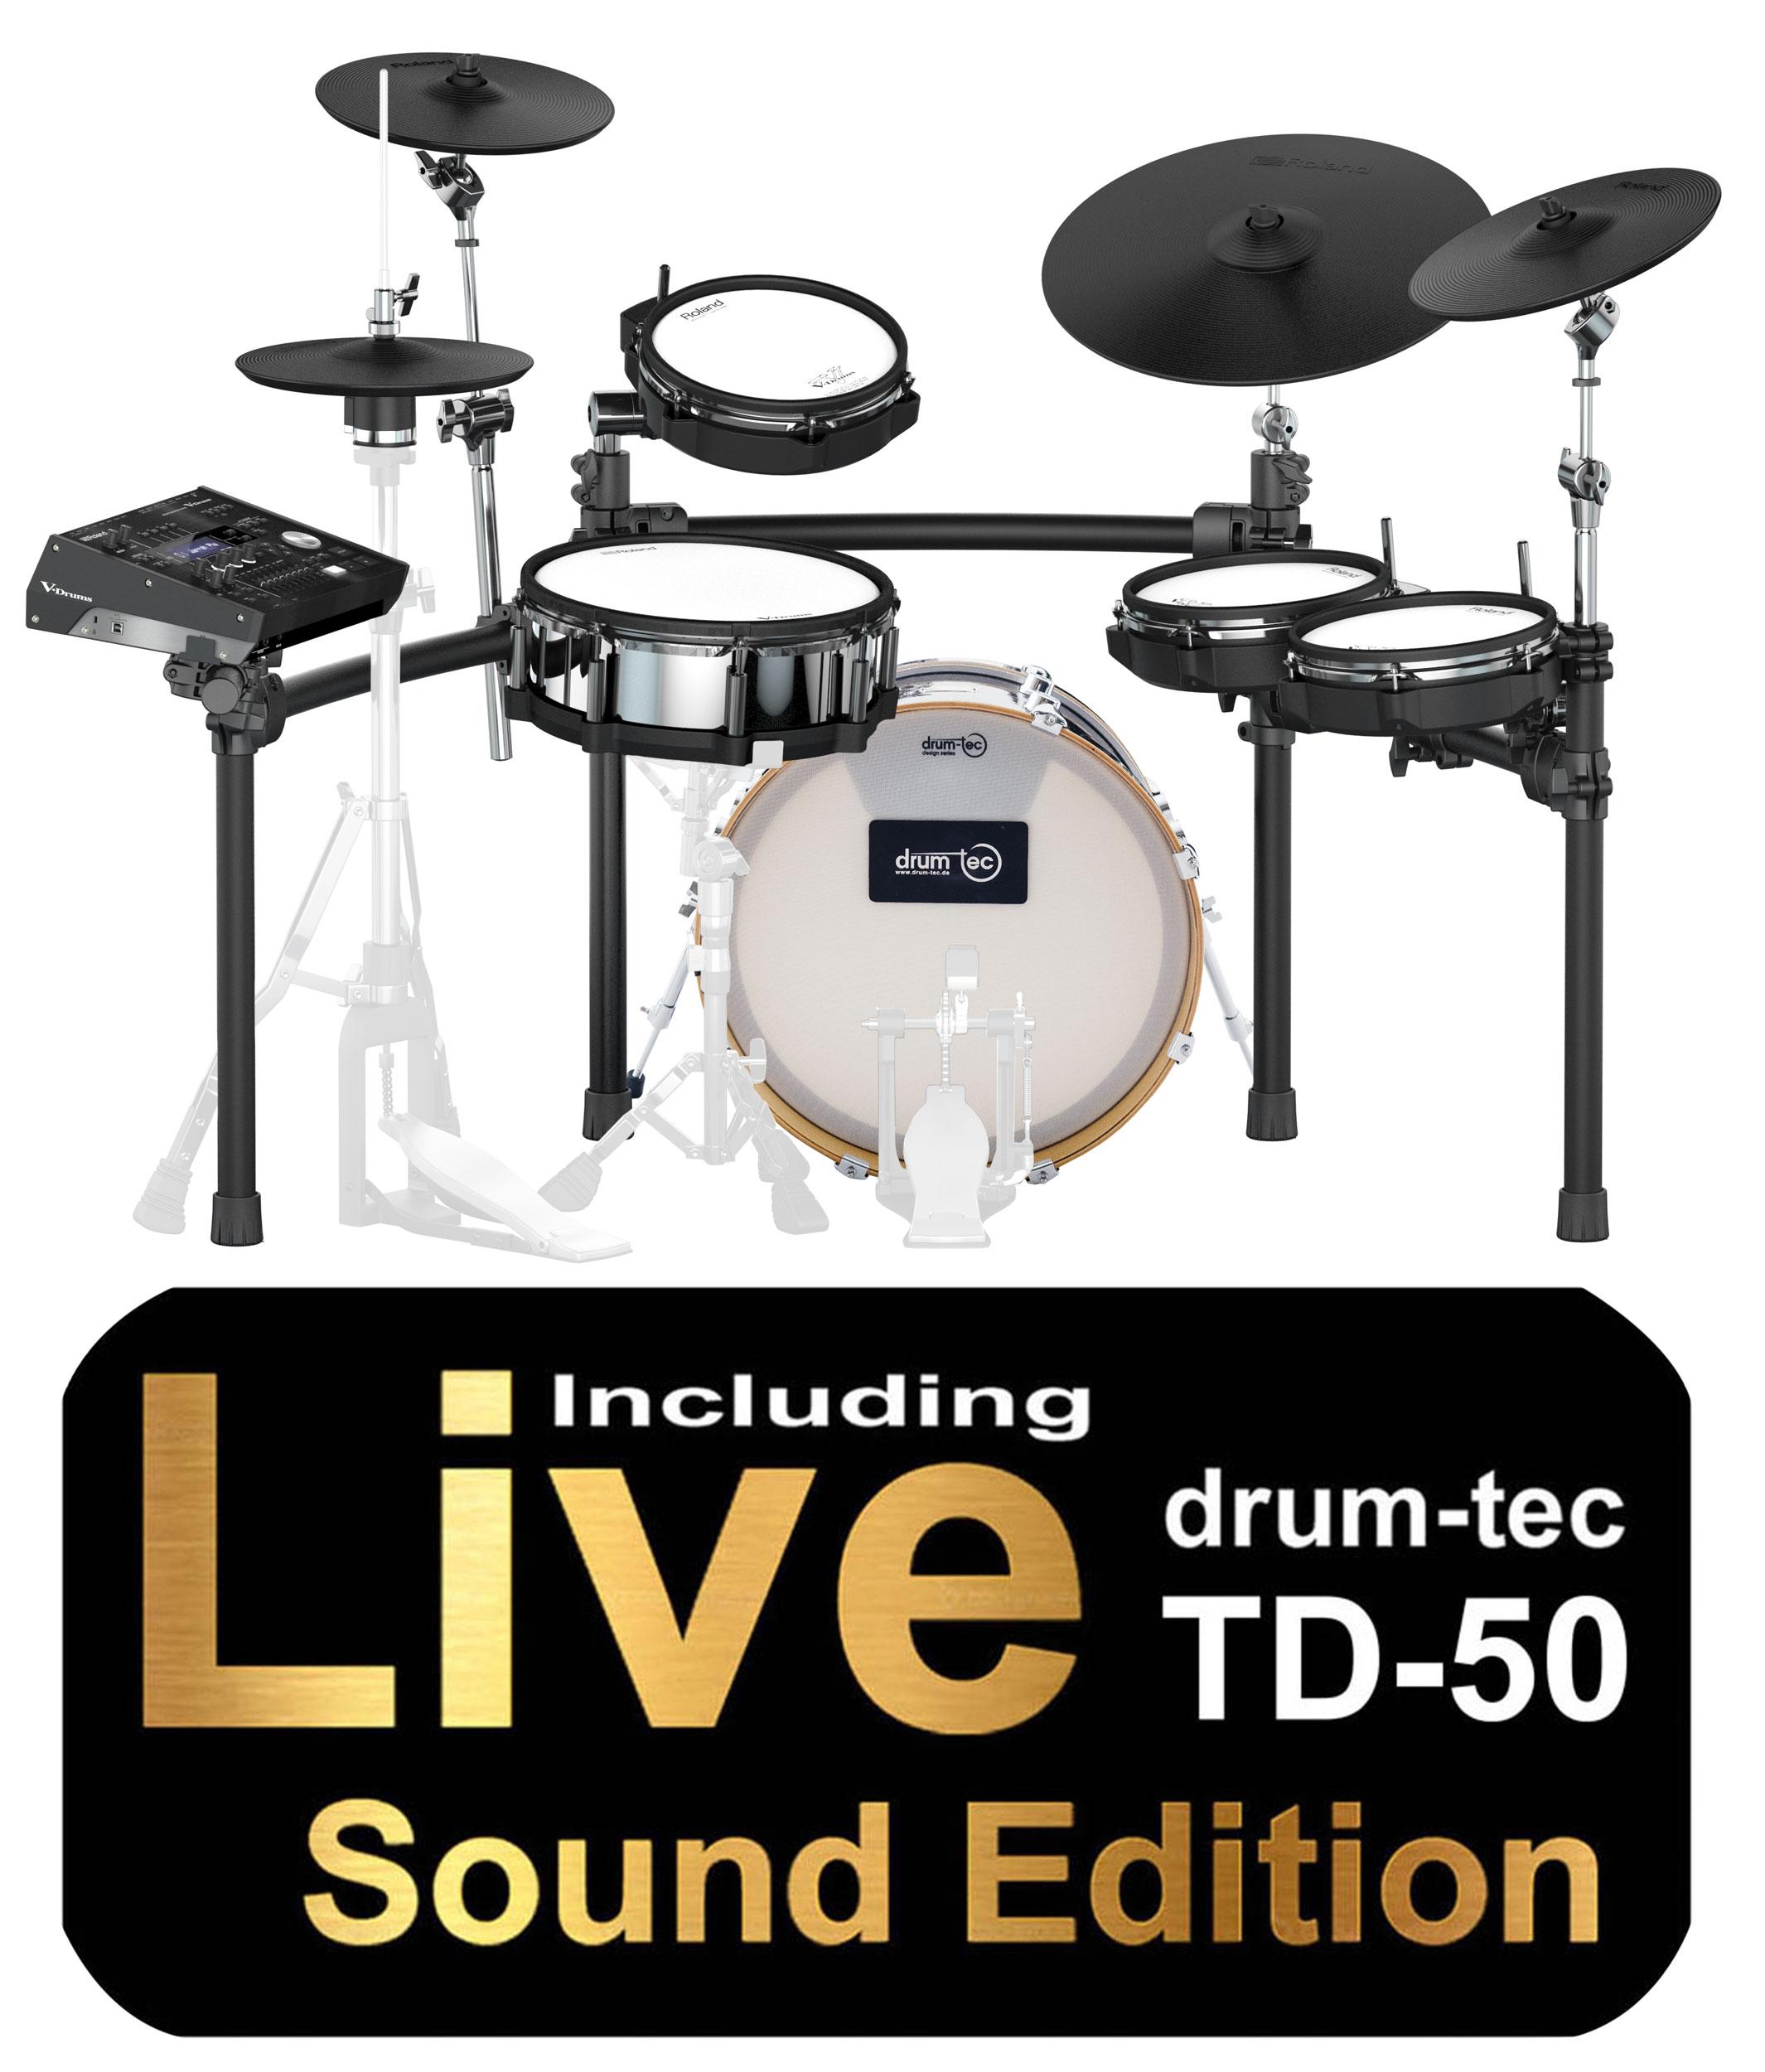 Roland TD-50KX drum-tec Edition with Sound Edition & MDS-50K